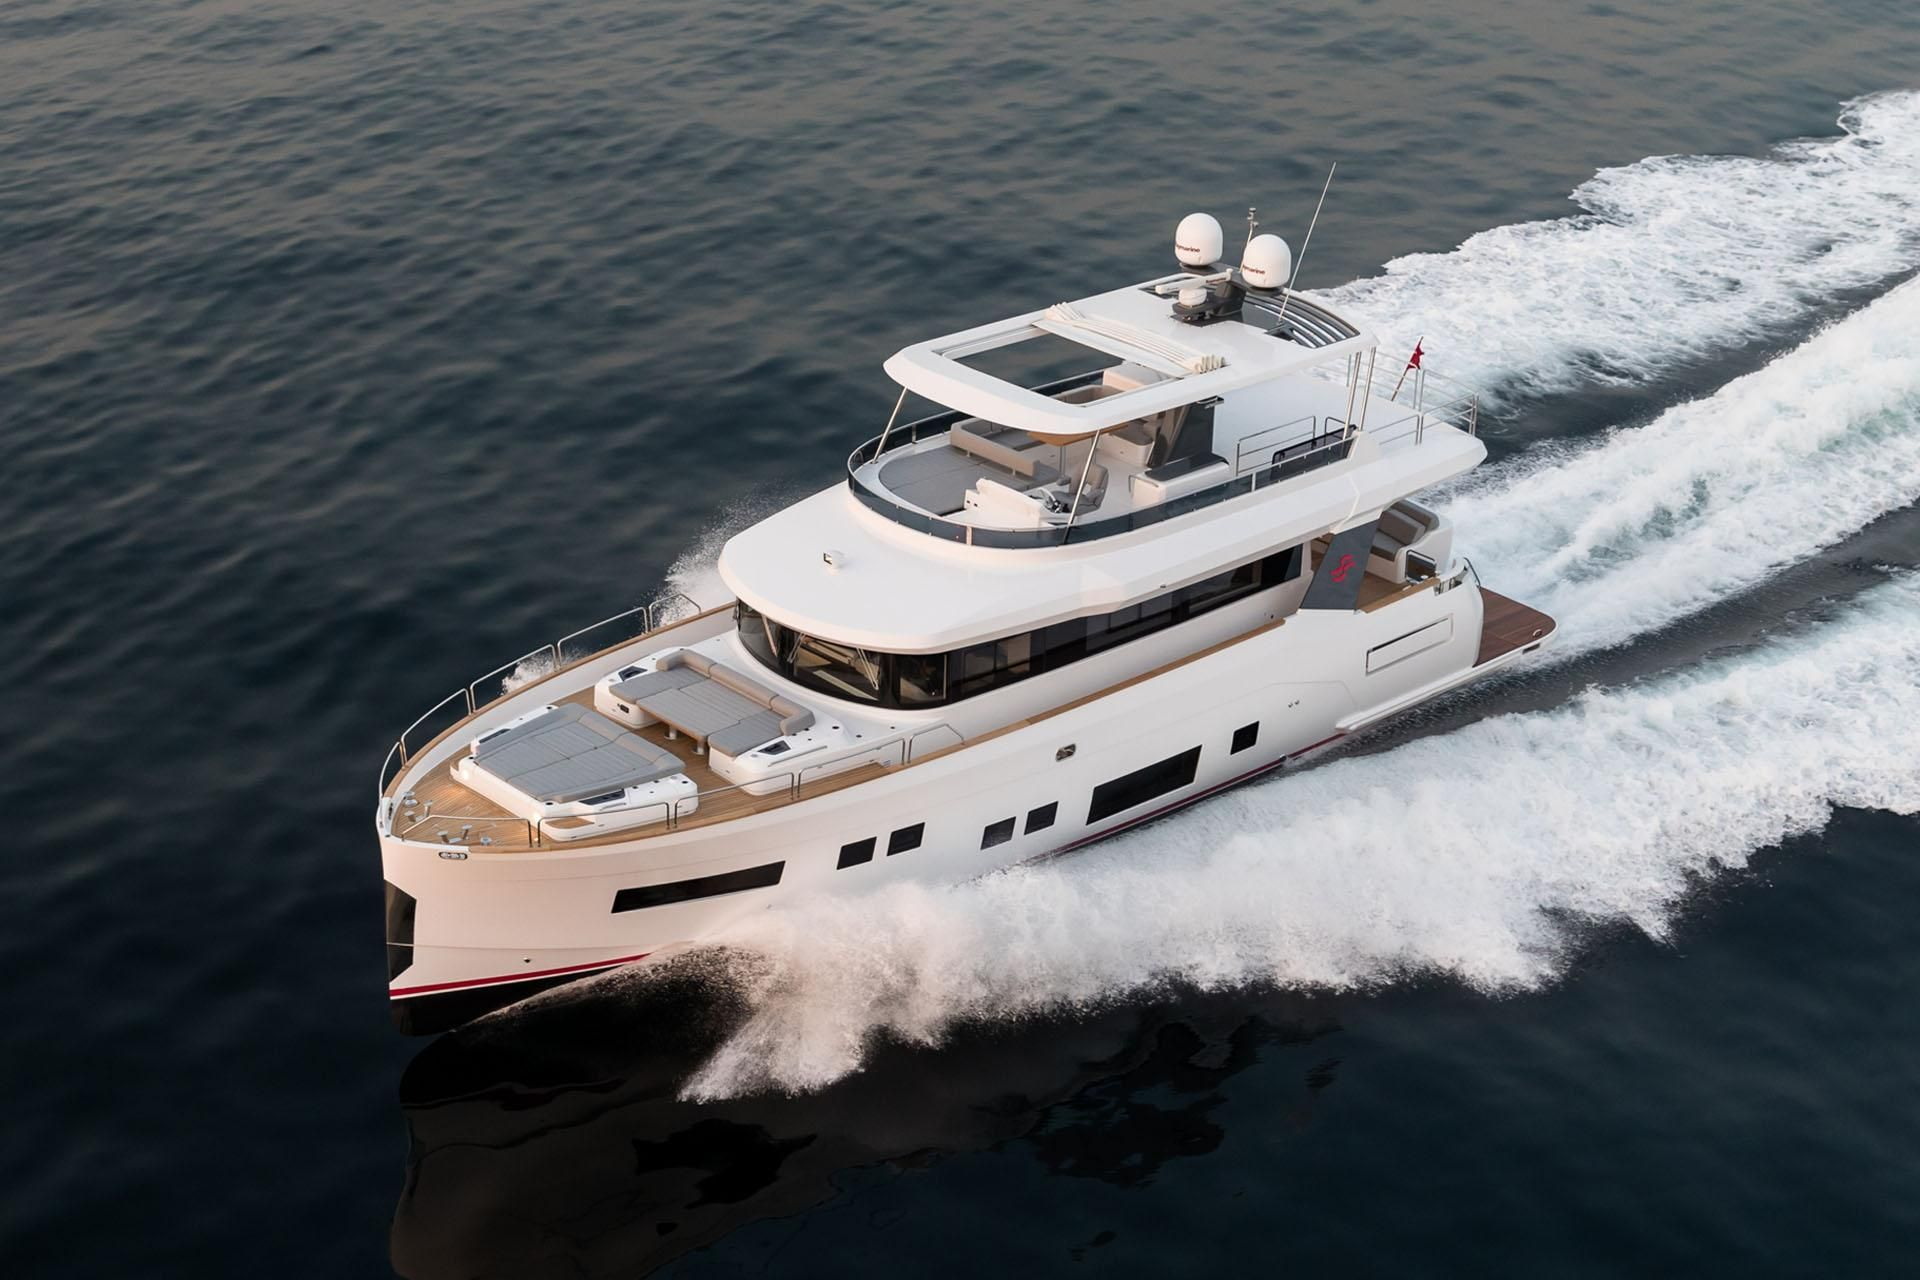 SAIM / Yacht Controller FZ-LLC